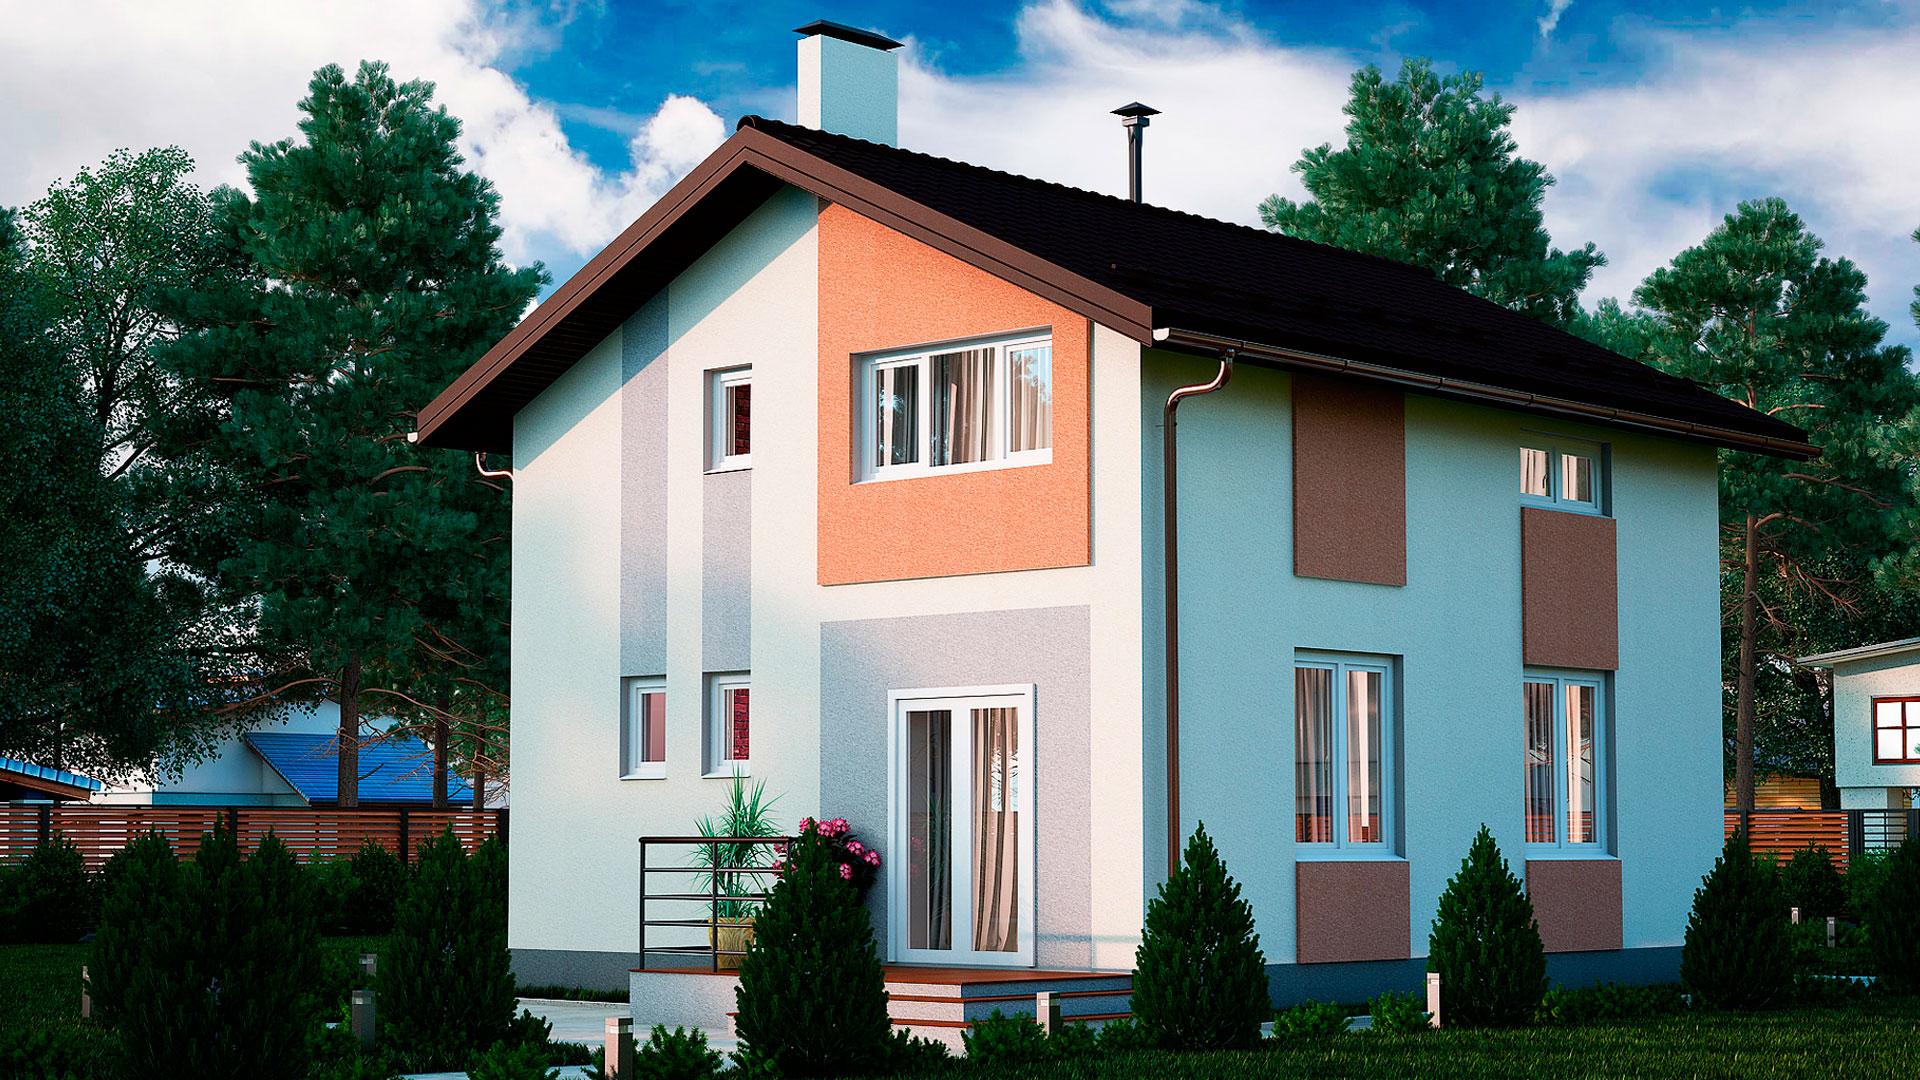 Задний фасад двухэтажного дома, проект БЭНПАН МС-97.